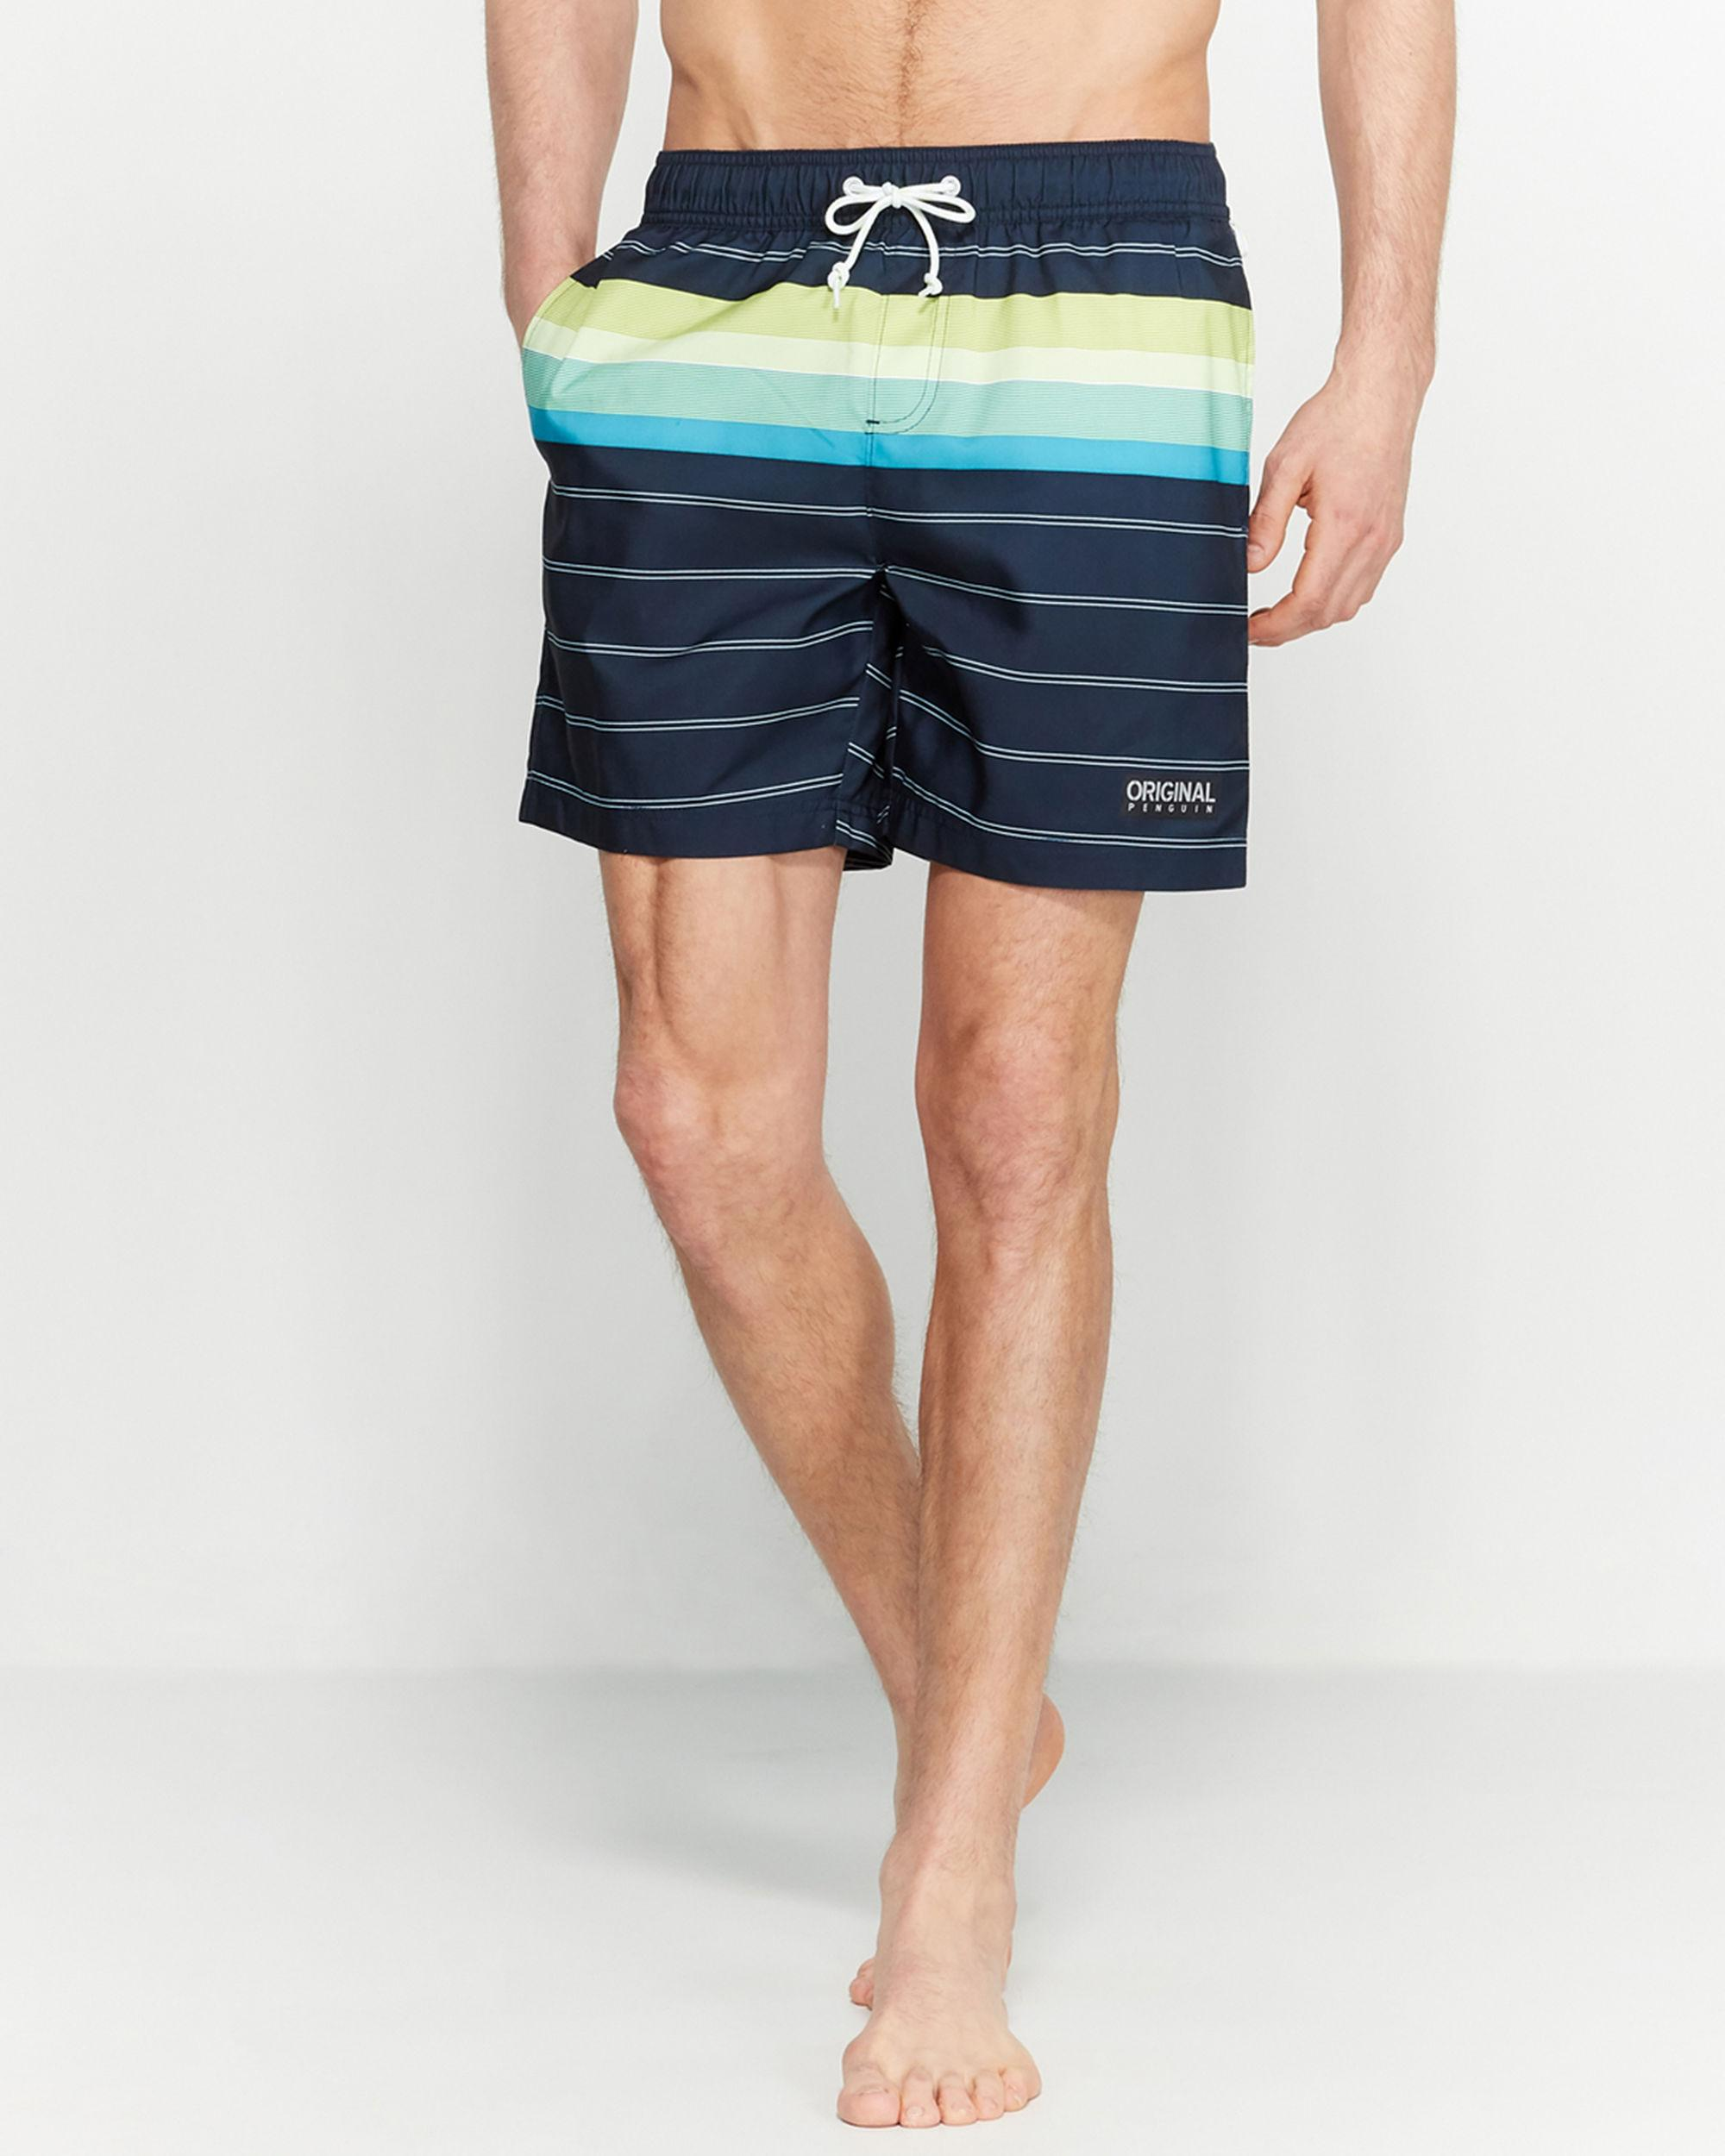 eb74656671 Original Penguin. Men's Blue Dark Sapphire Engineered Stripe Swim Trunks